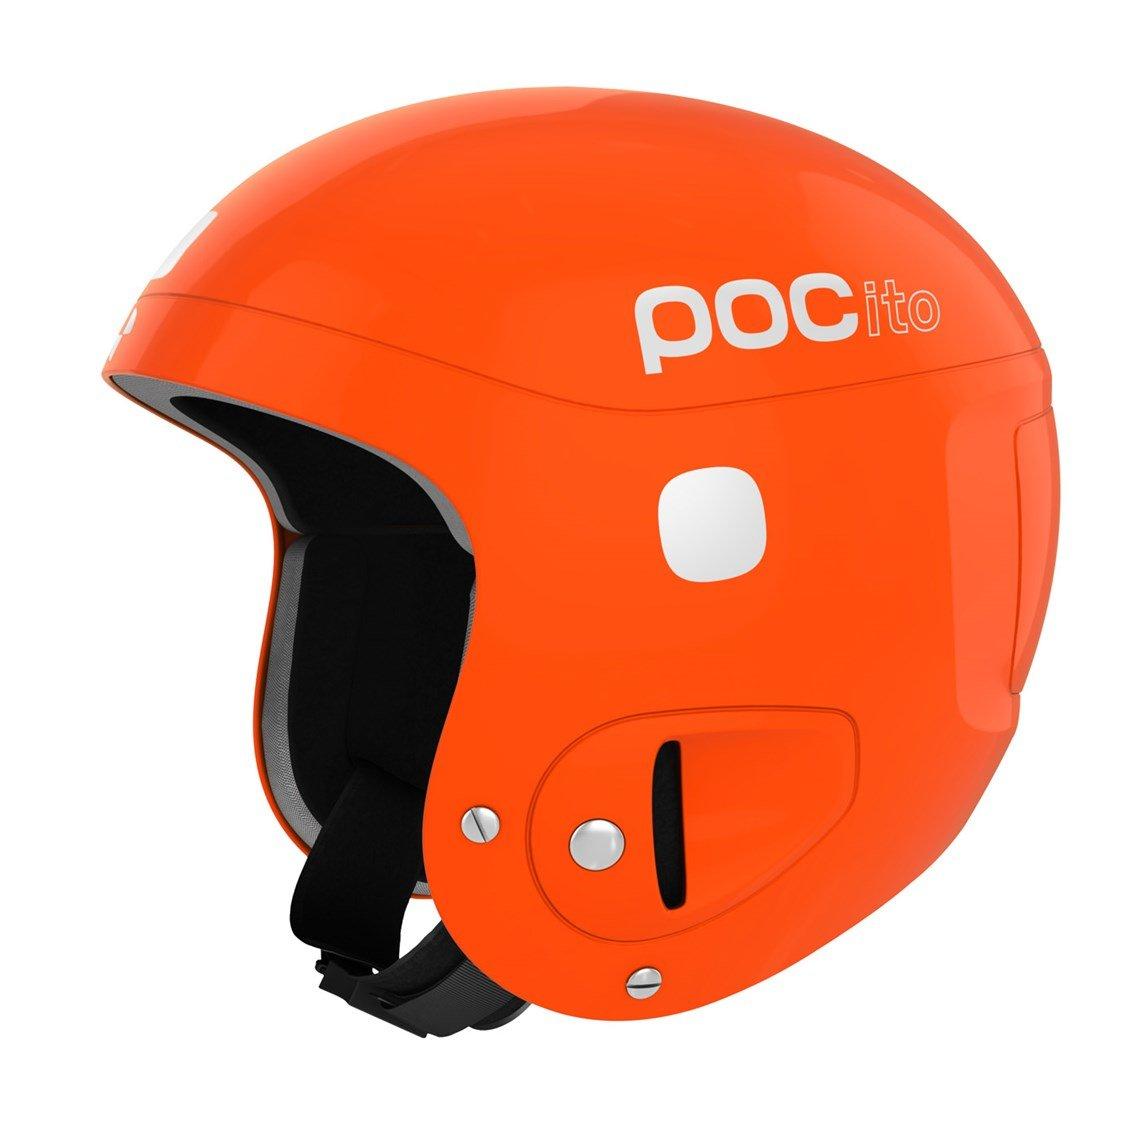 POC POCito Helmet (Fluorescent Orange, Adjustable)